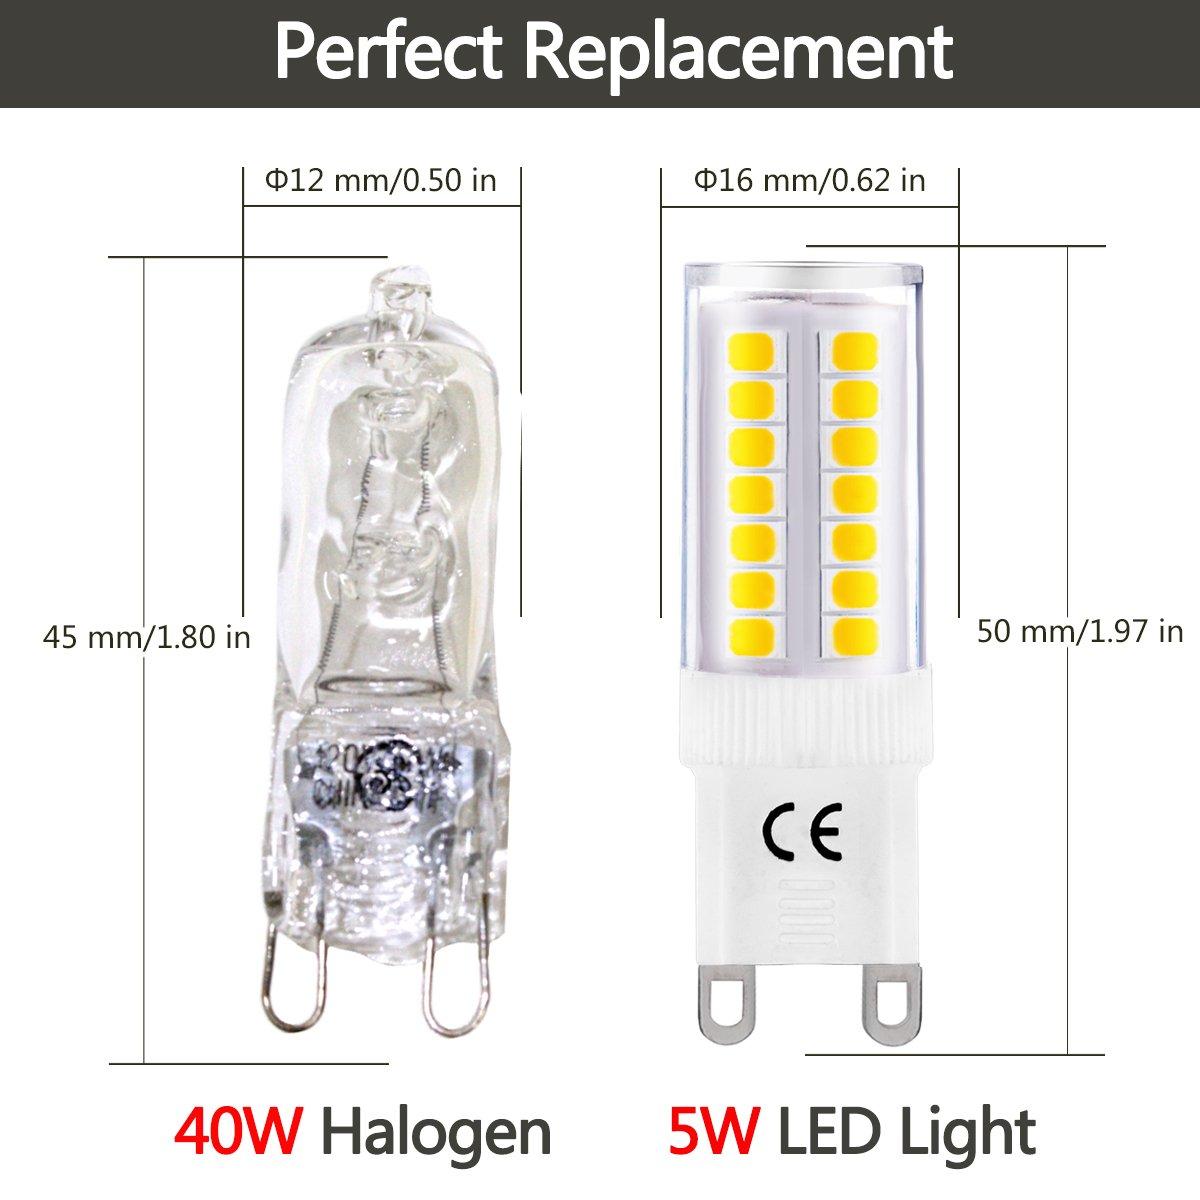 LOHAS® G9 Bombilla de LED de 5 Vatios, 400lm, 3000K Blanco Cálido, Recambio de 40 Vatios, Ángulo de Haz de 360°, 220-240V AC, No Regulable - Pack de 6: ...